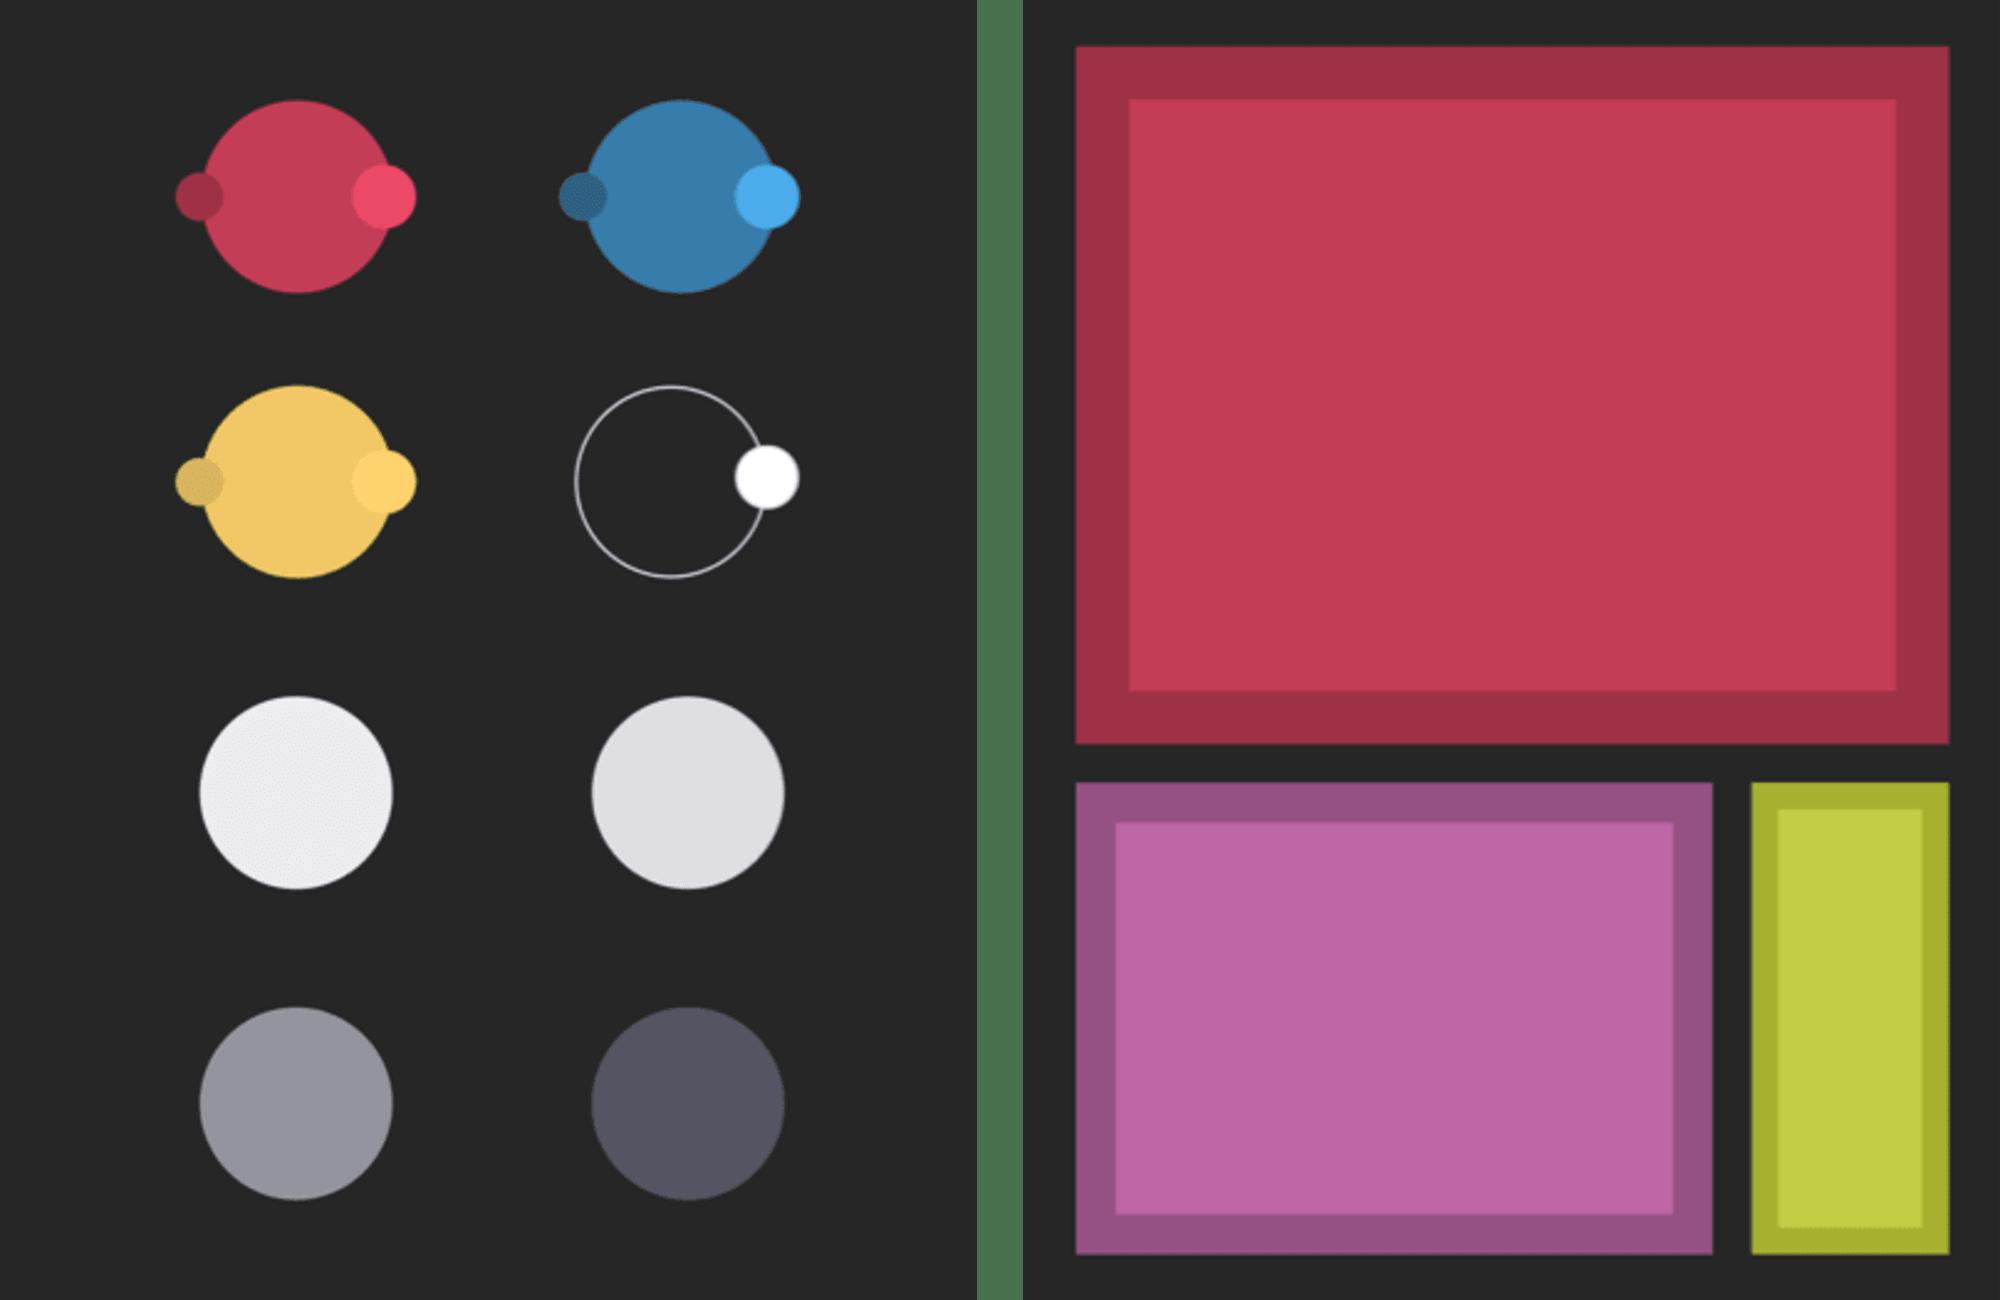 color palette against a dark background